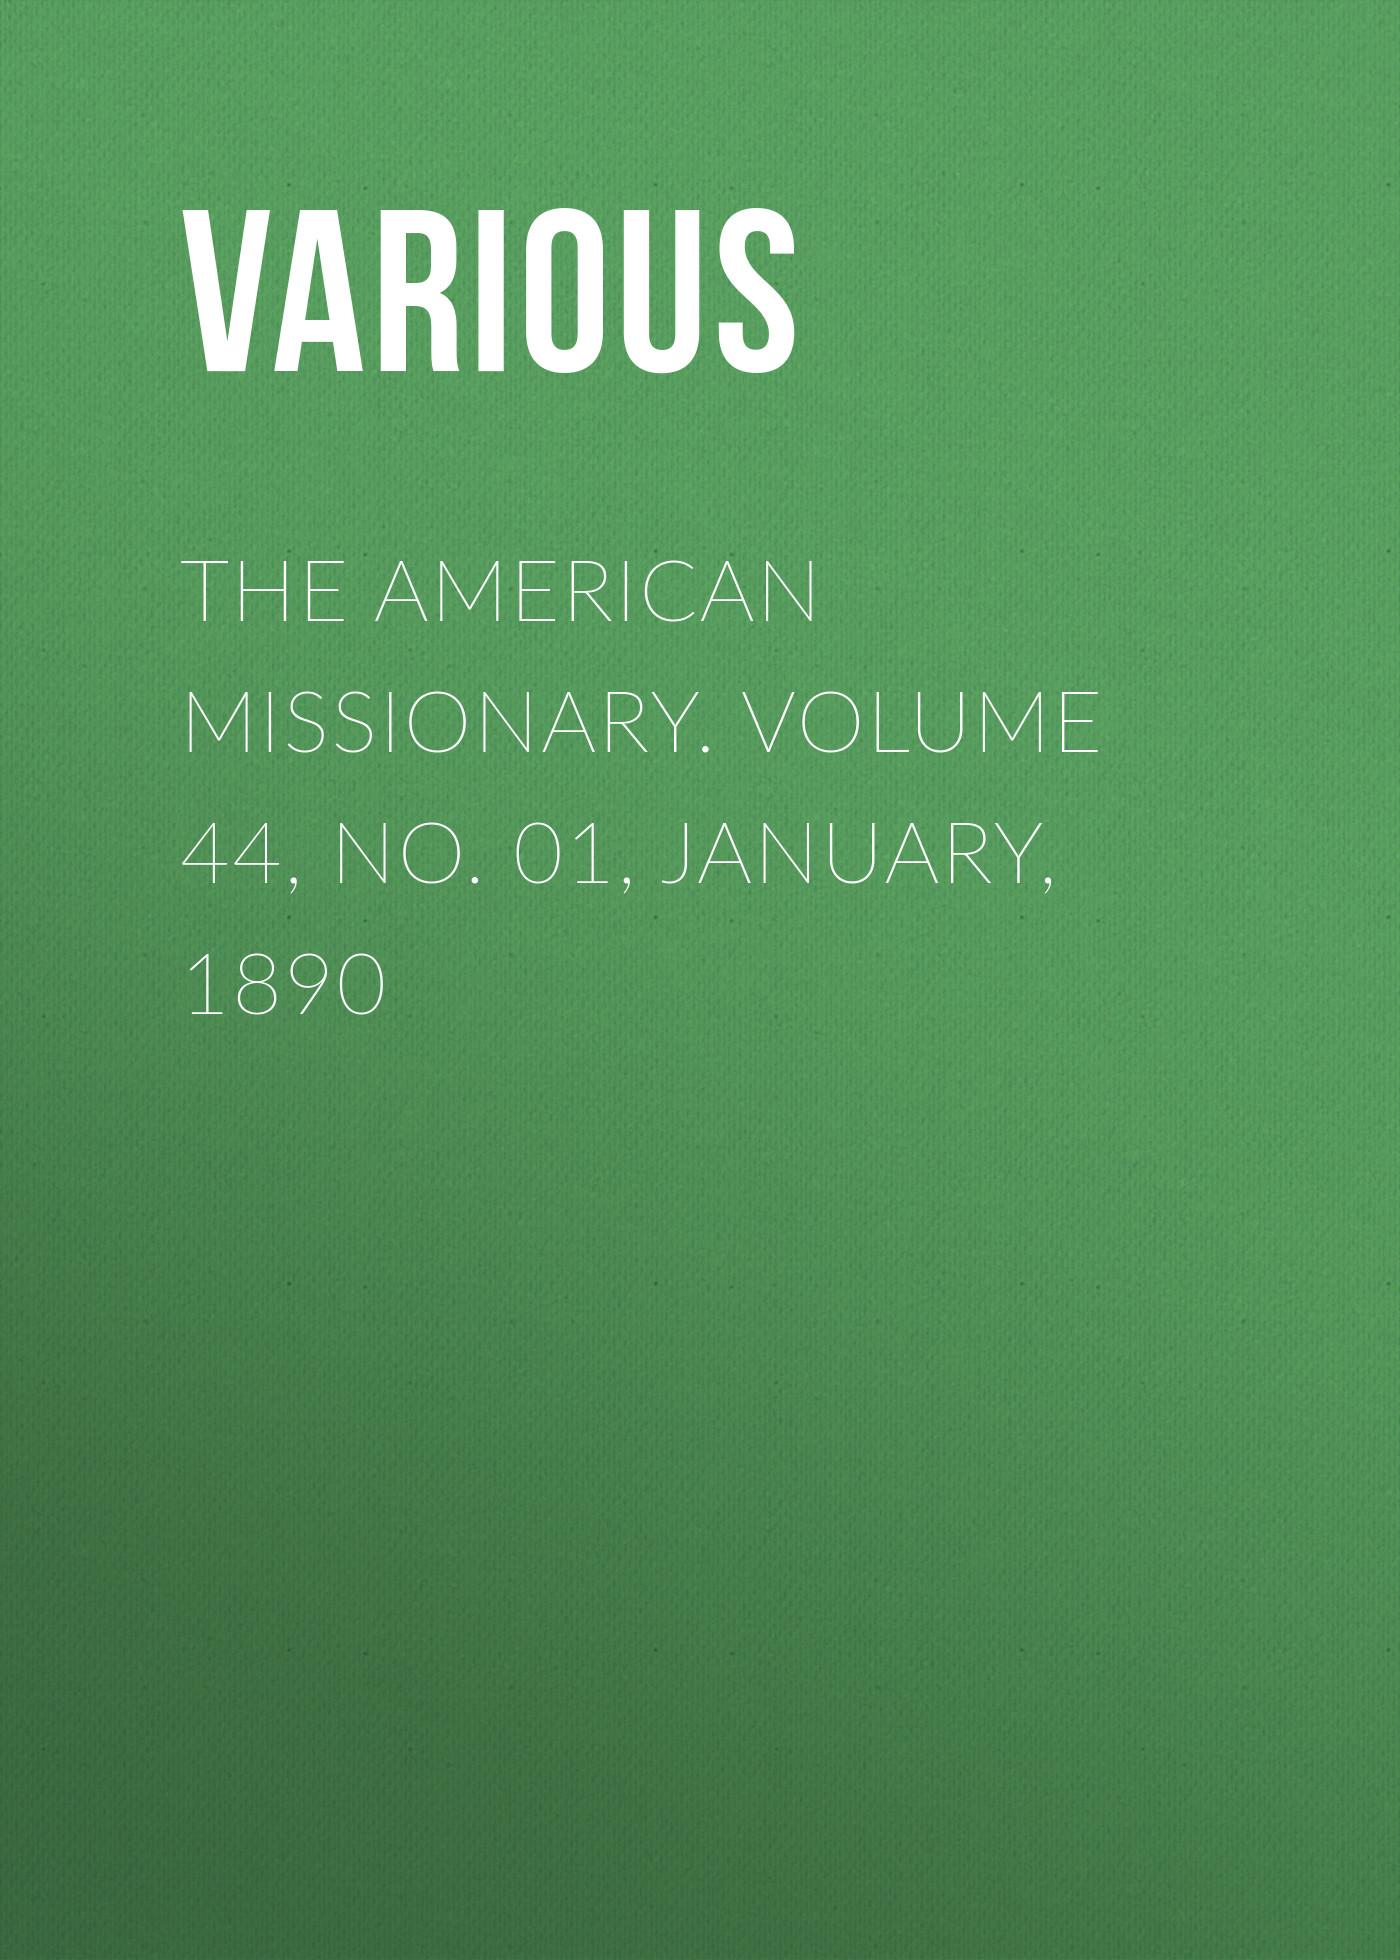 лучшая цена Various The American Missionary. Volume 44, No. 01, January, 1890